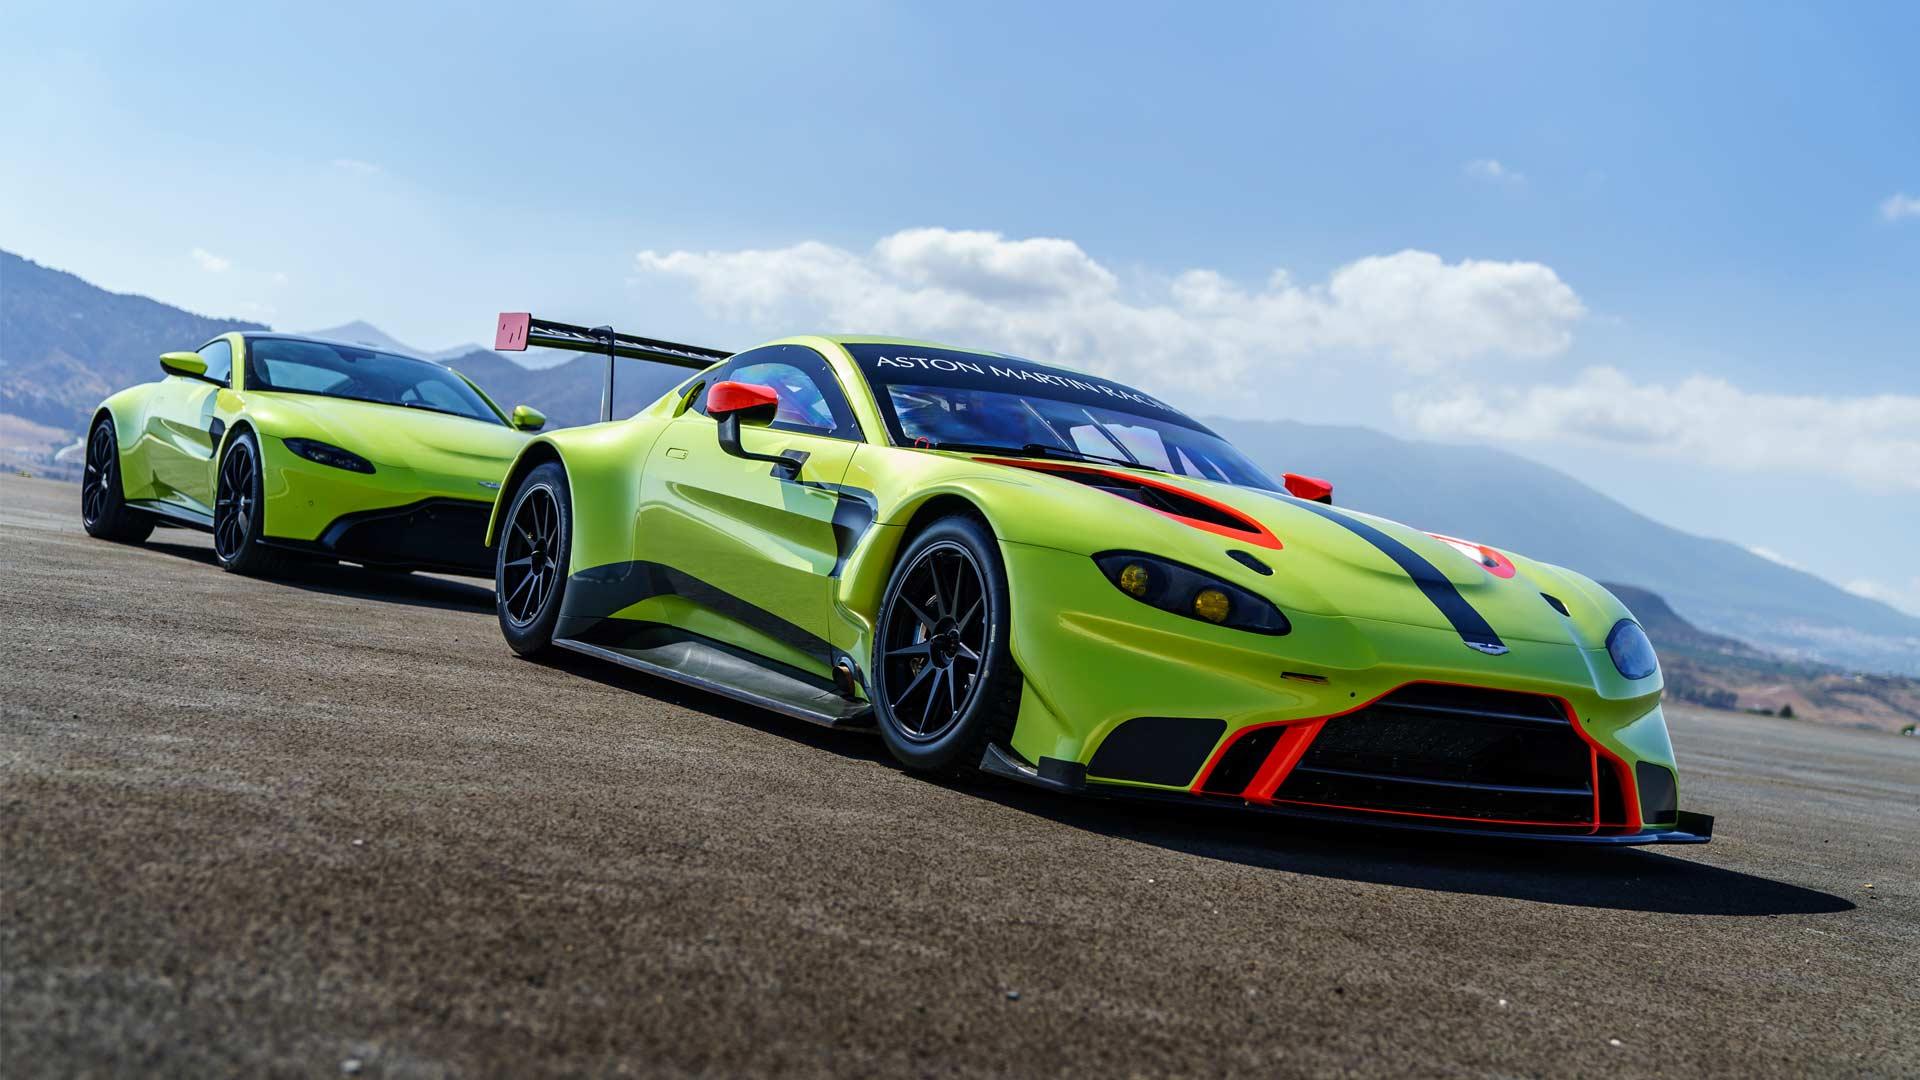 2018 Aston Martin Vantage GTE ready for Endurance - Autodevot